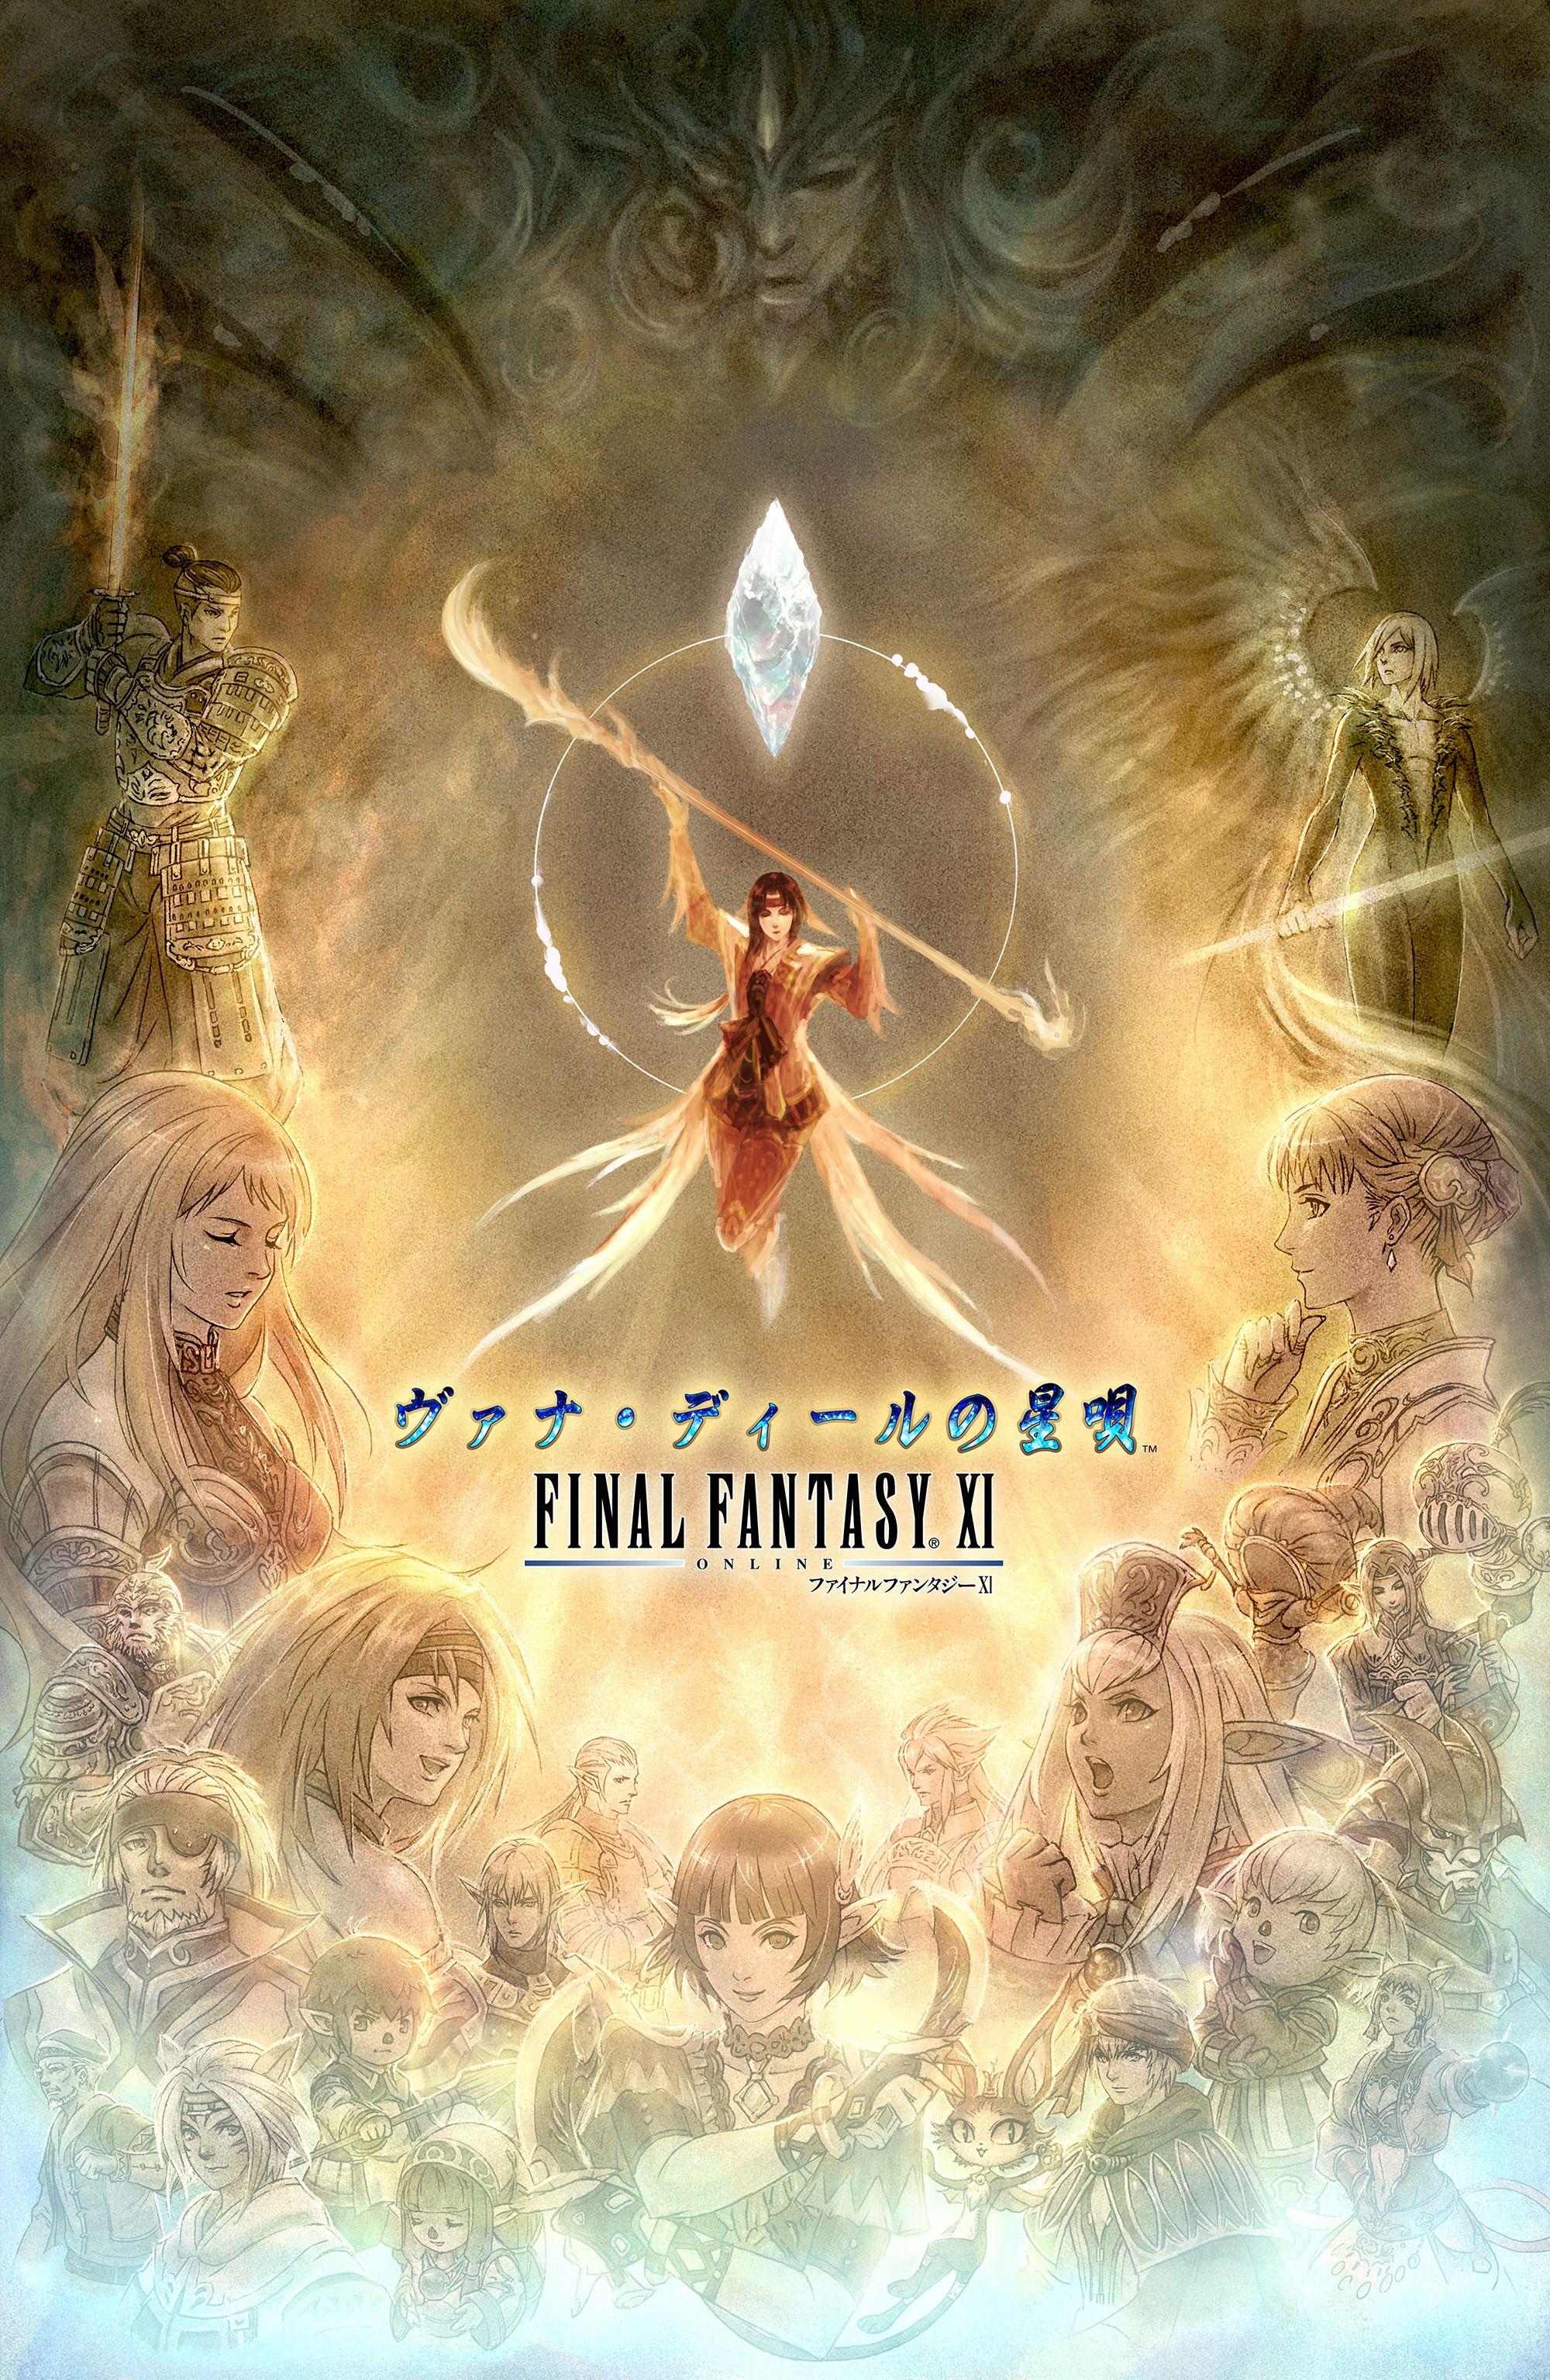 Final Fantasy XI: Rhapsodies of Vana'diel